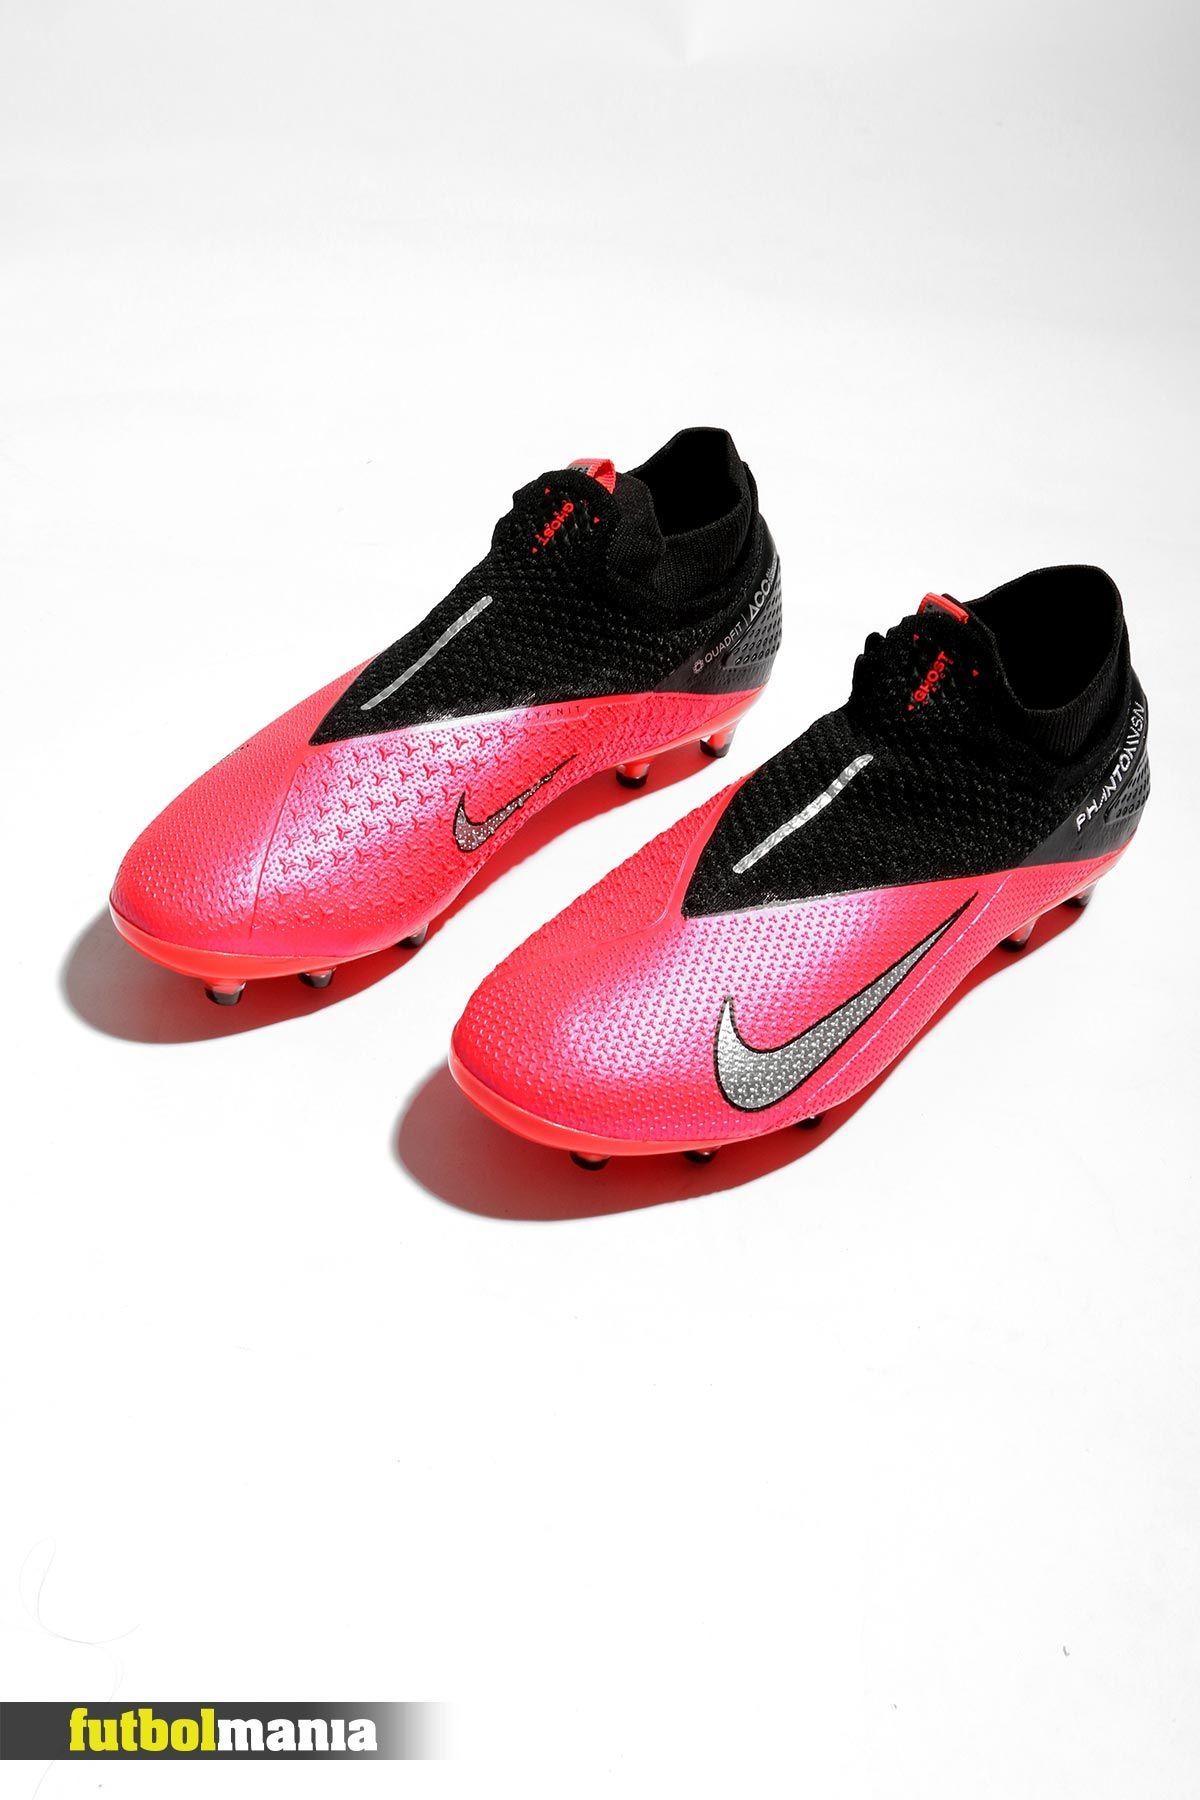 cuchara Es barato válvula  Nike Phantom Vision | Nike fútbol, Zapatos de fútbol nike, Botas de futbol  nike